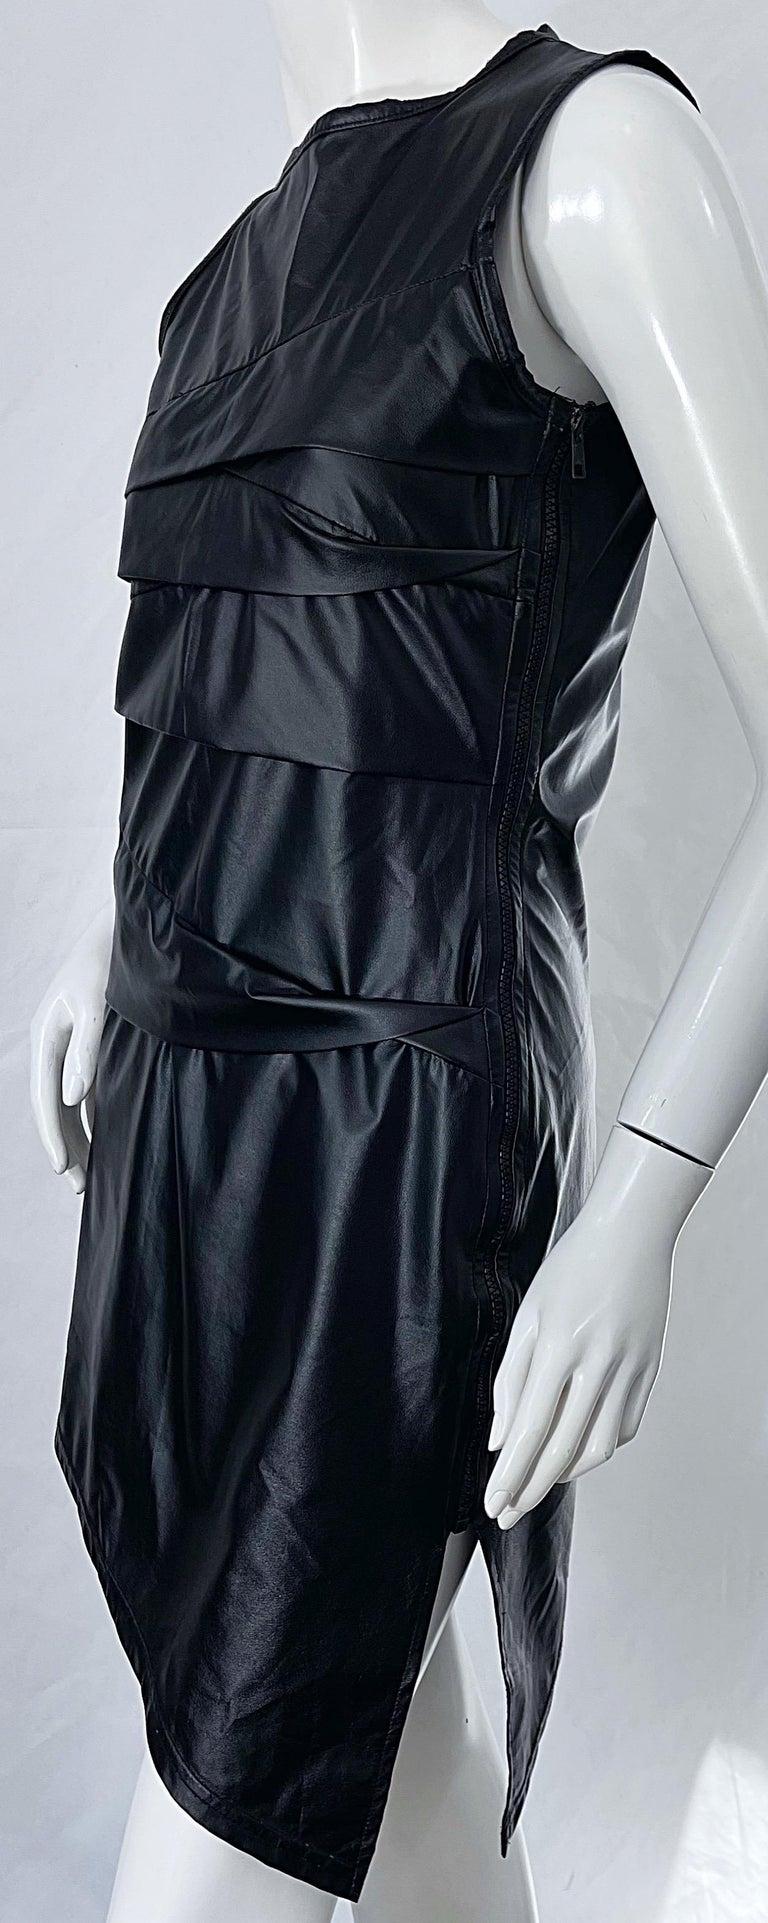 1990s Dexter Wong Club Kid Rave Japanese Black Pleather Vintage 90s Mini Dress For Sale 6